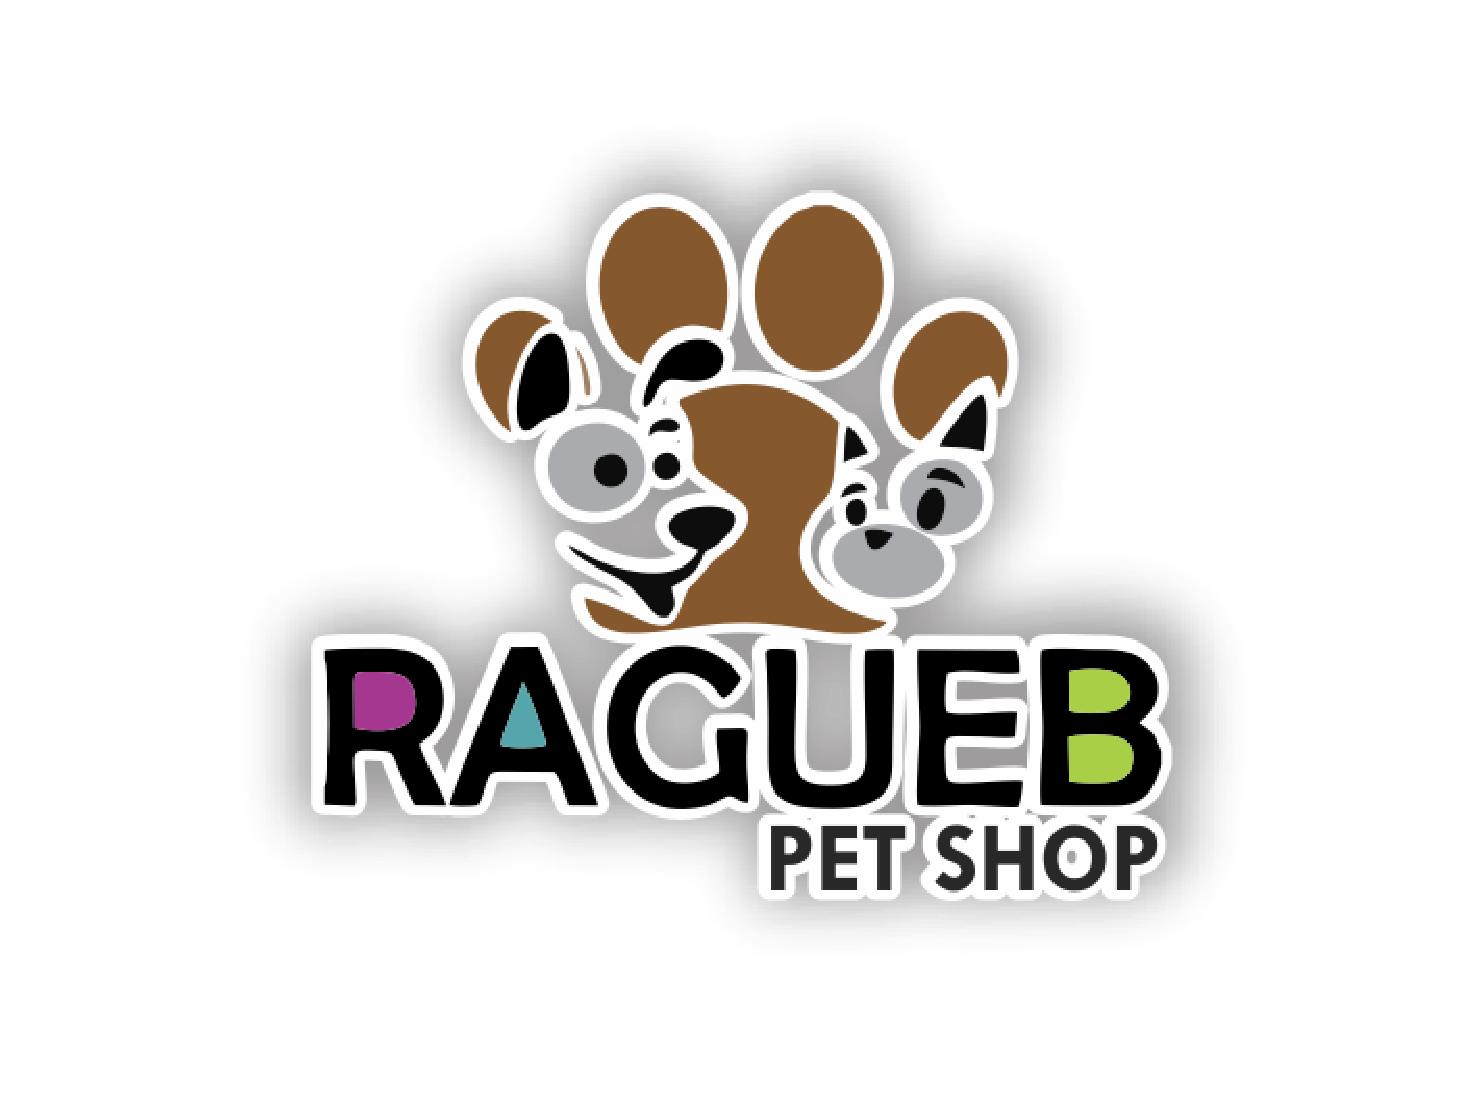 Ragueb Petshop